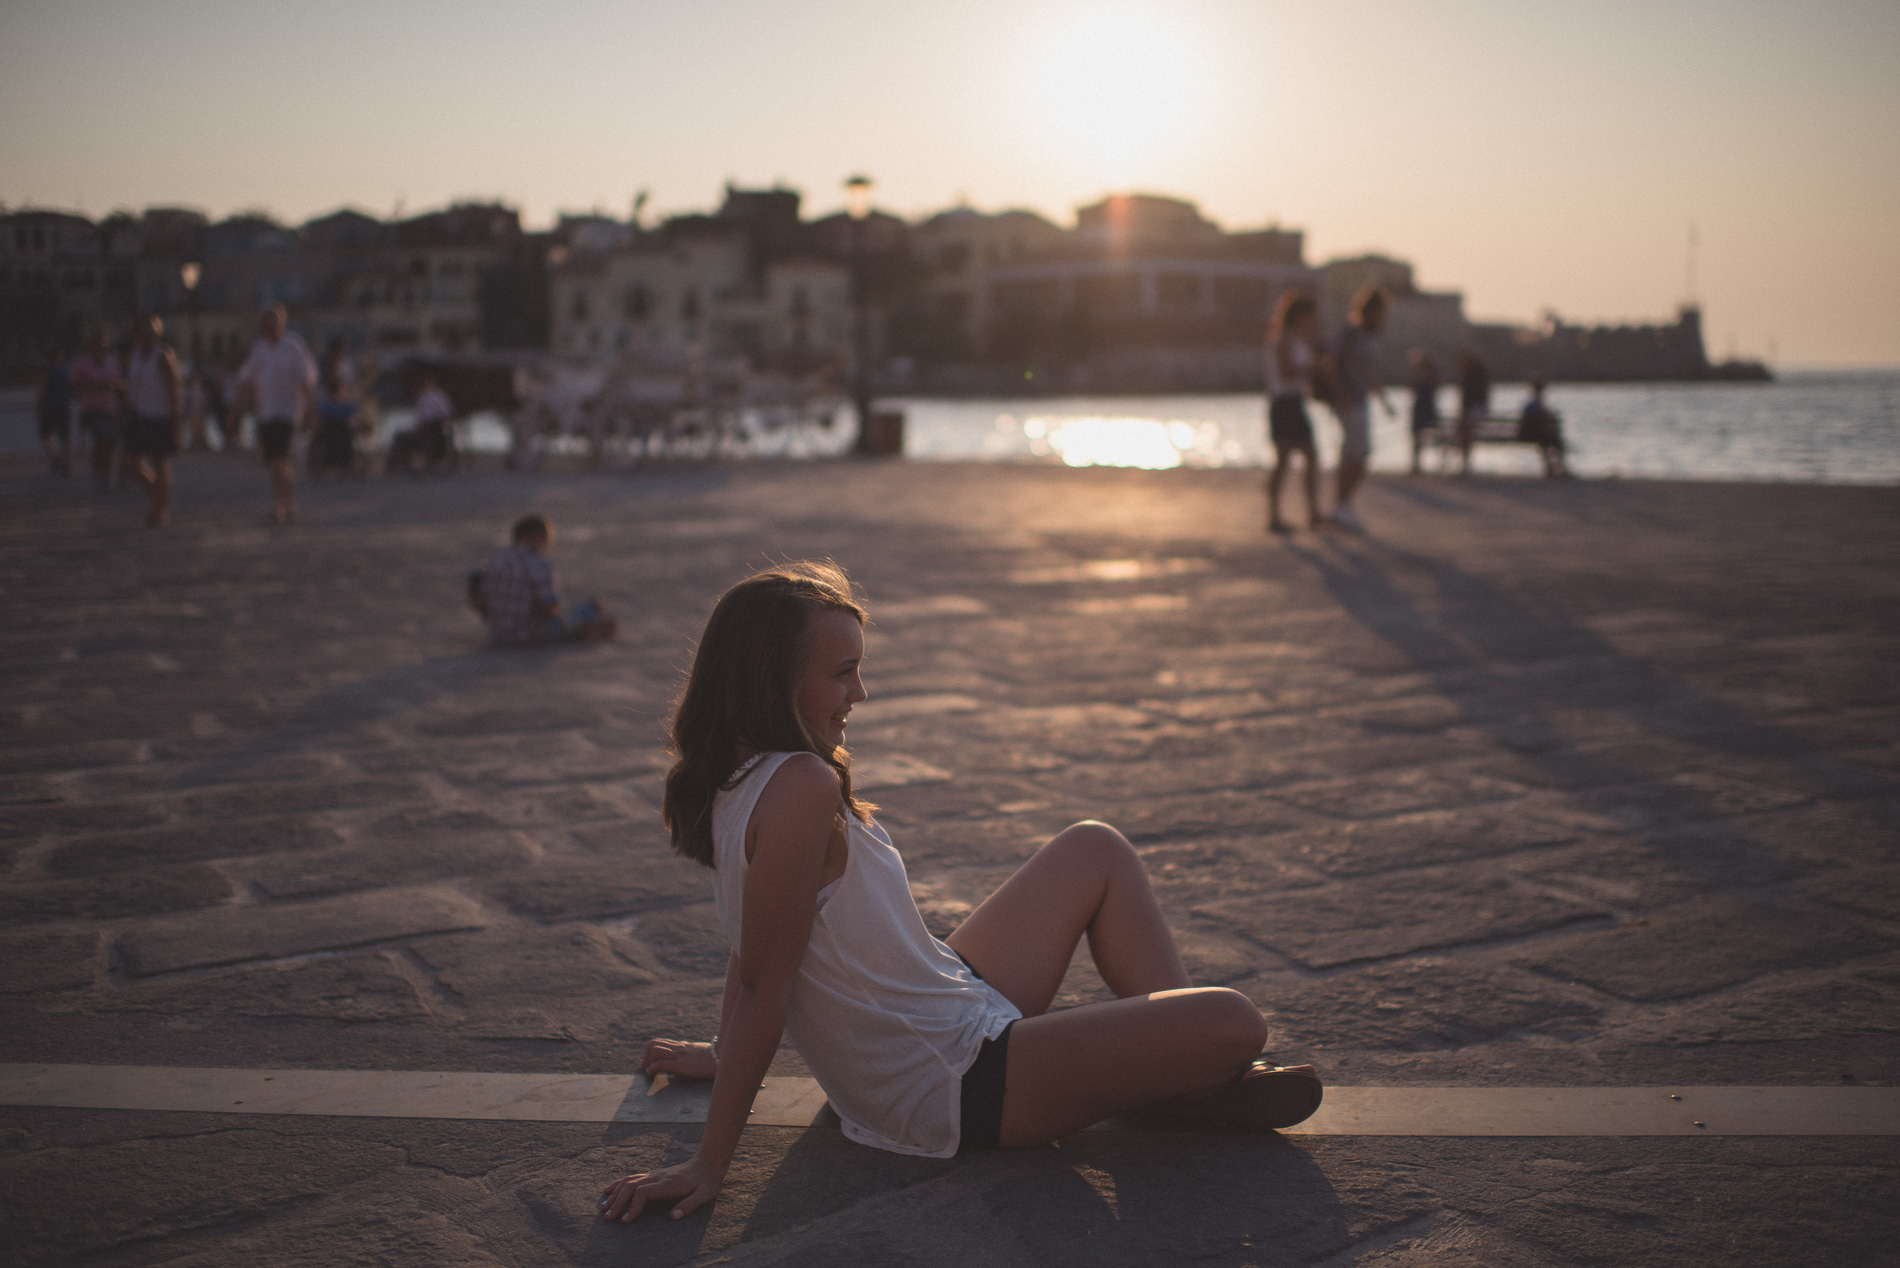 Sunset senior portrait in Chania Crete